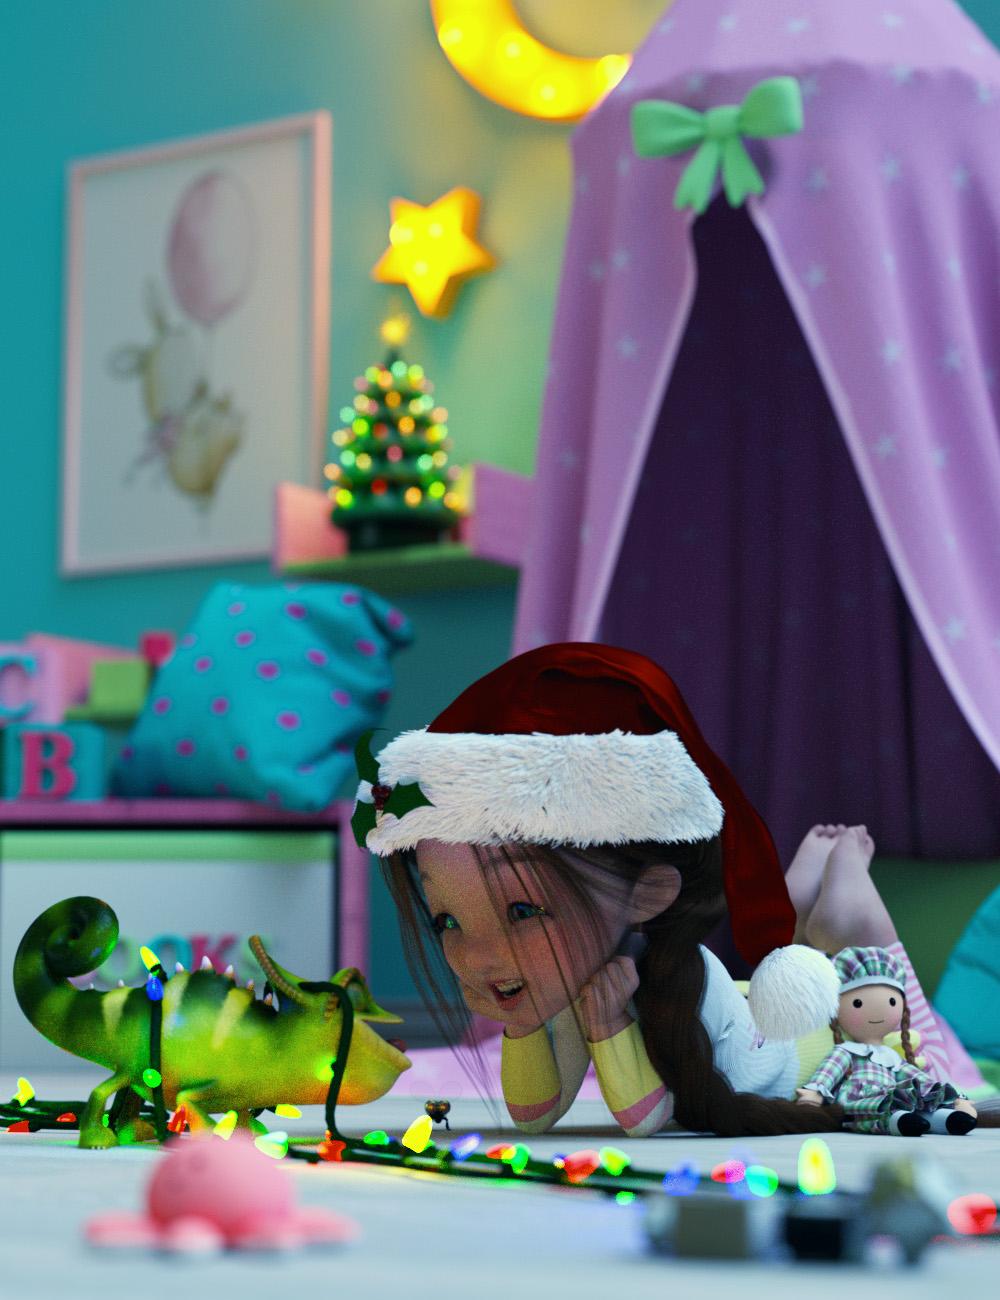 IGD BuggaBootiful Poses by: Islandgirl, 3D Models by Daz 3D